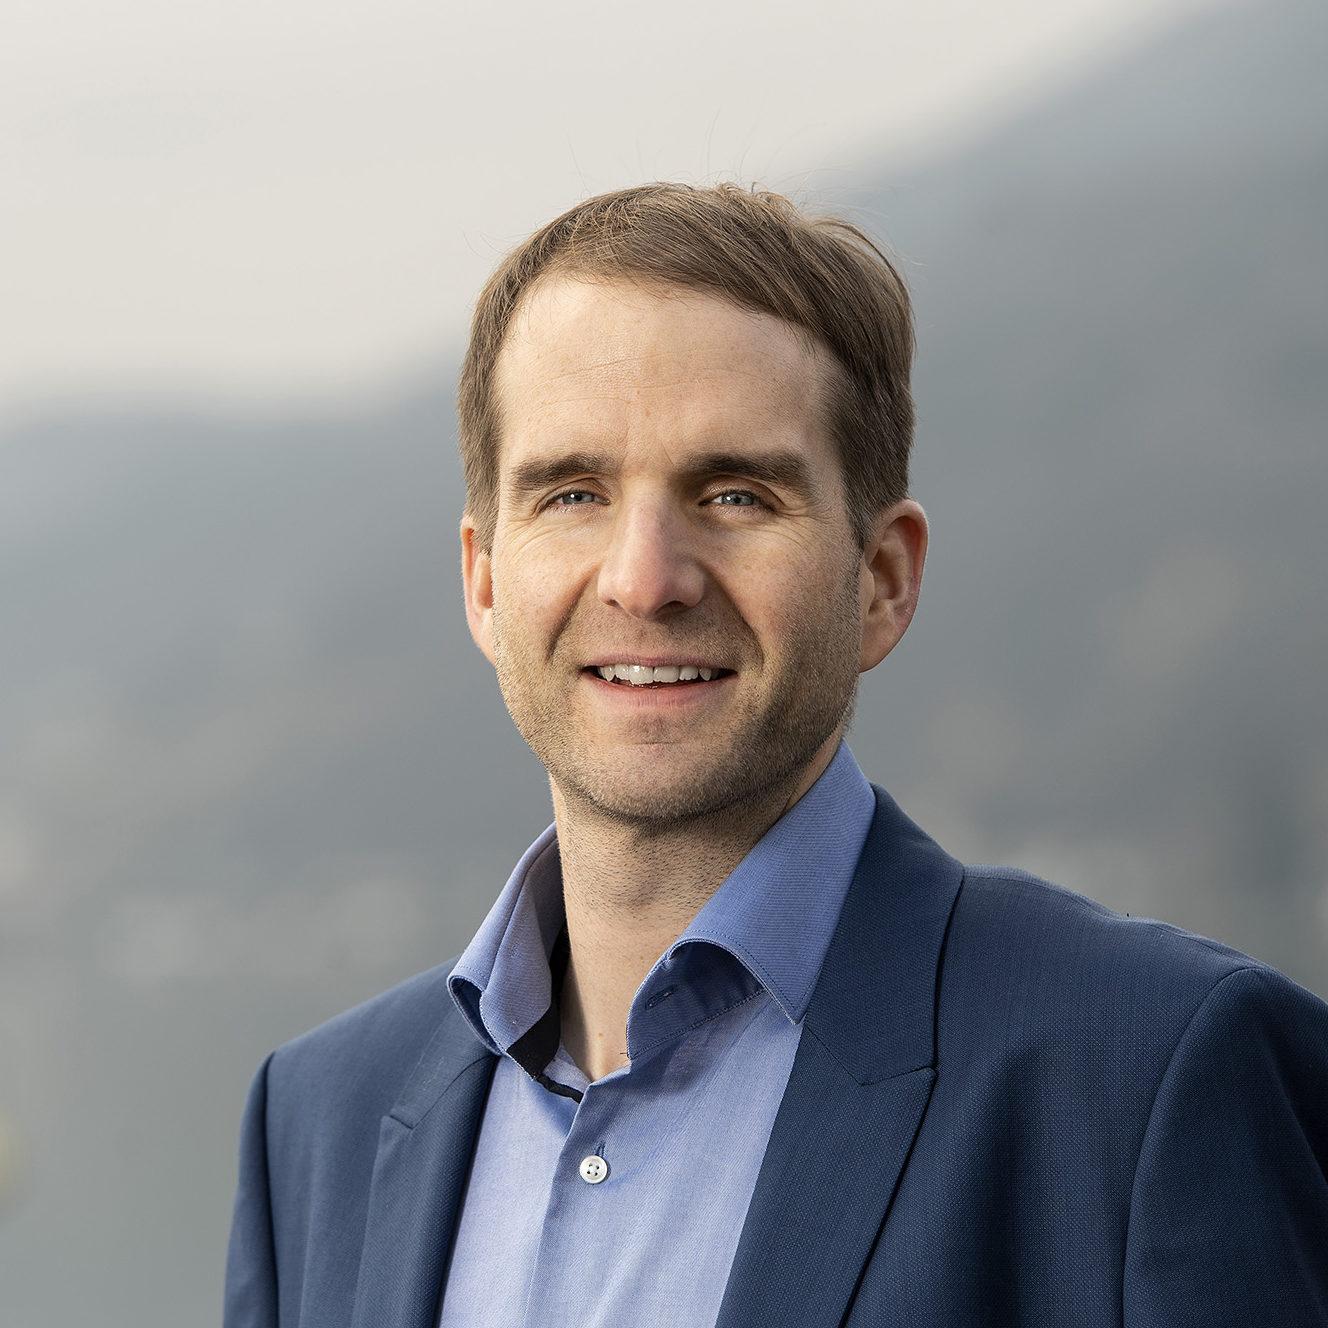 Simon Eberhard